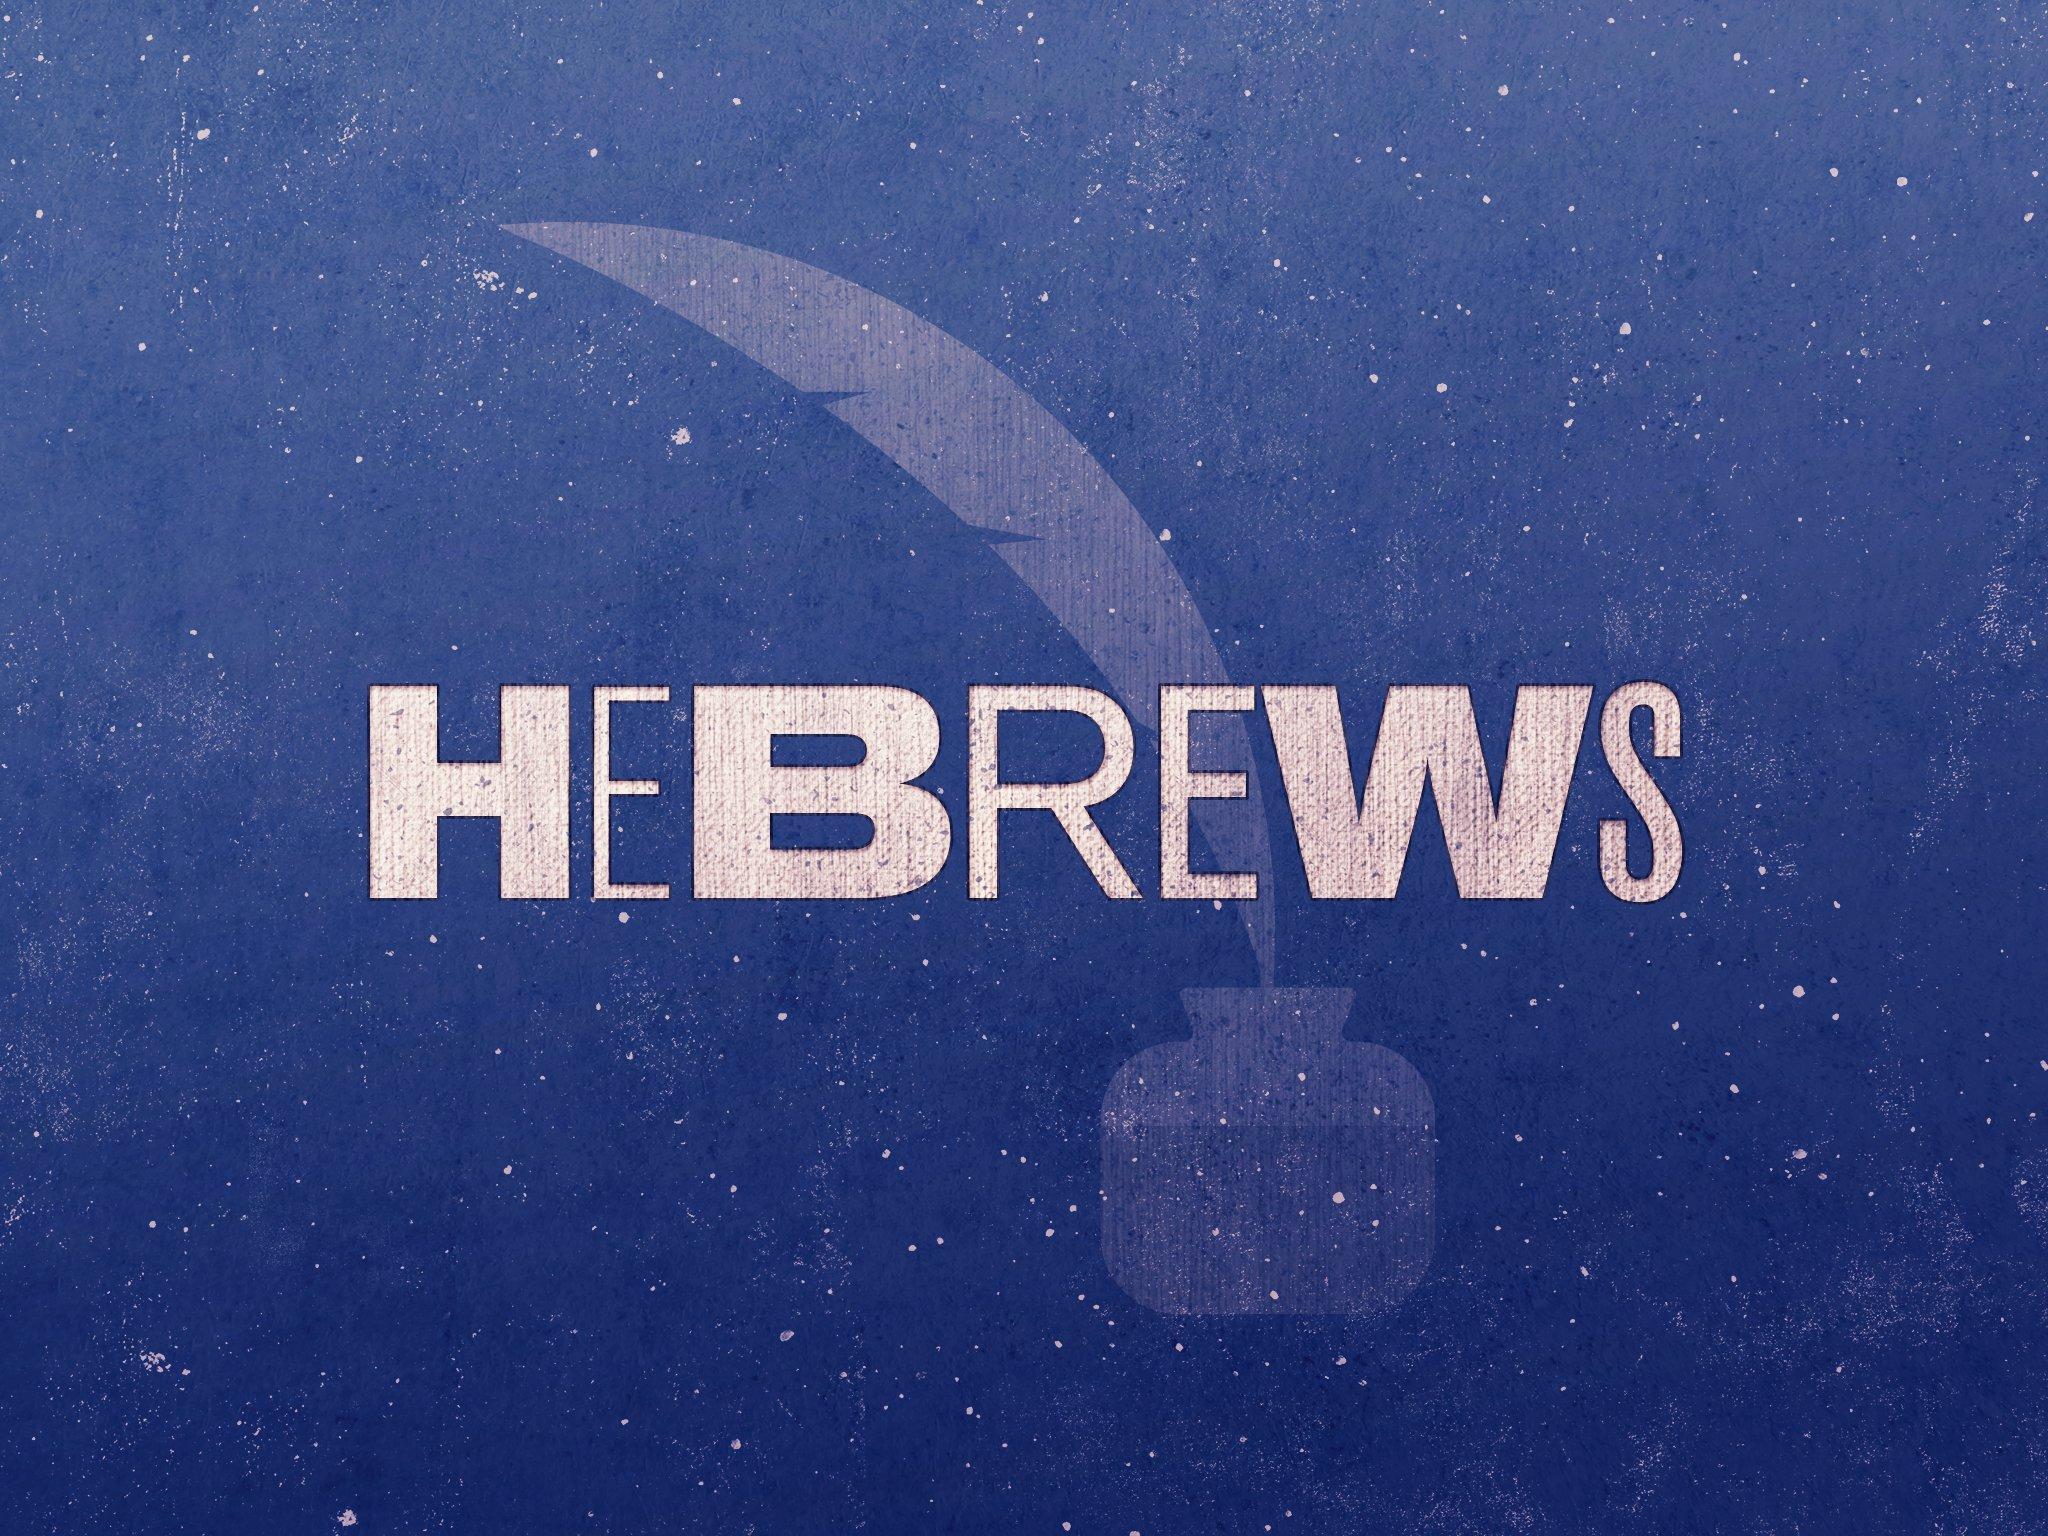 58-Hebrews_Title_4x3-fullscreen.jpg